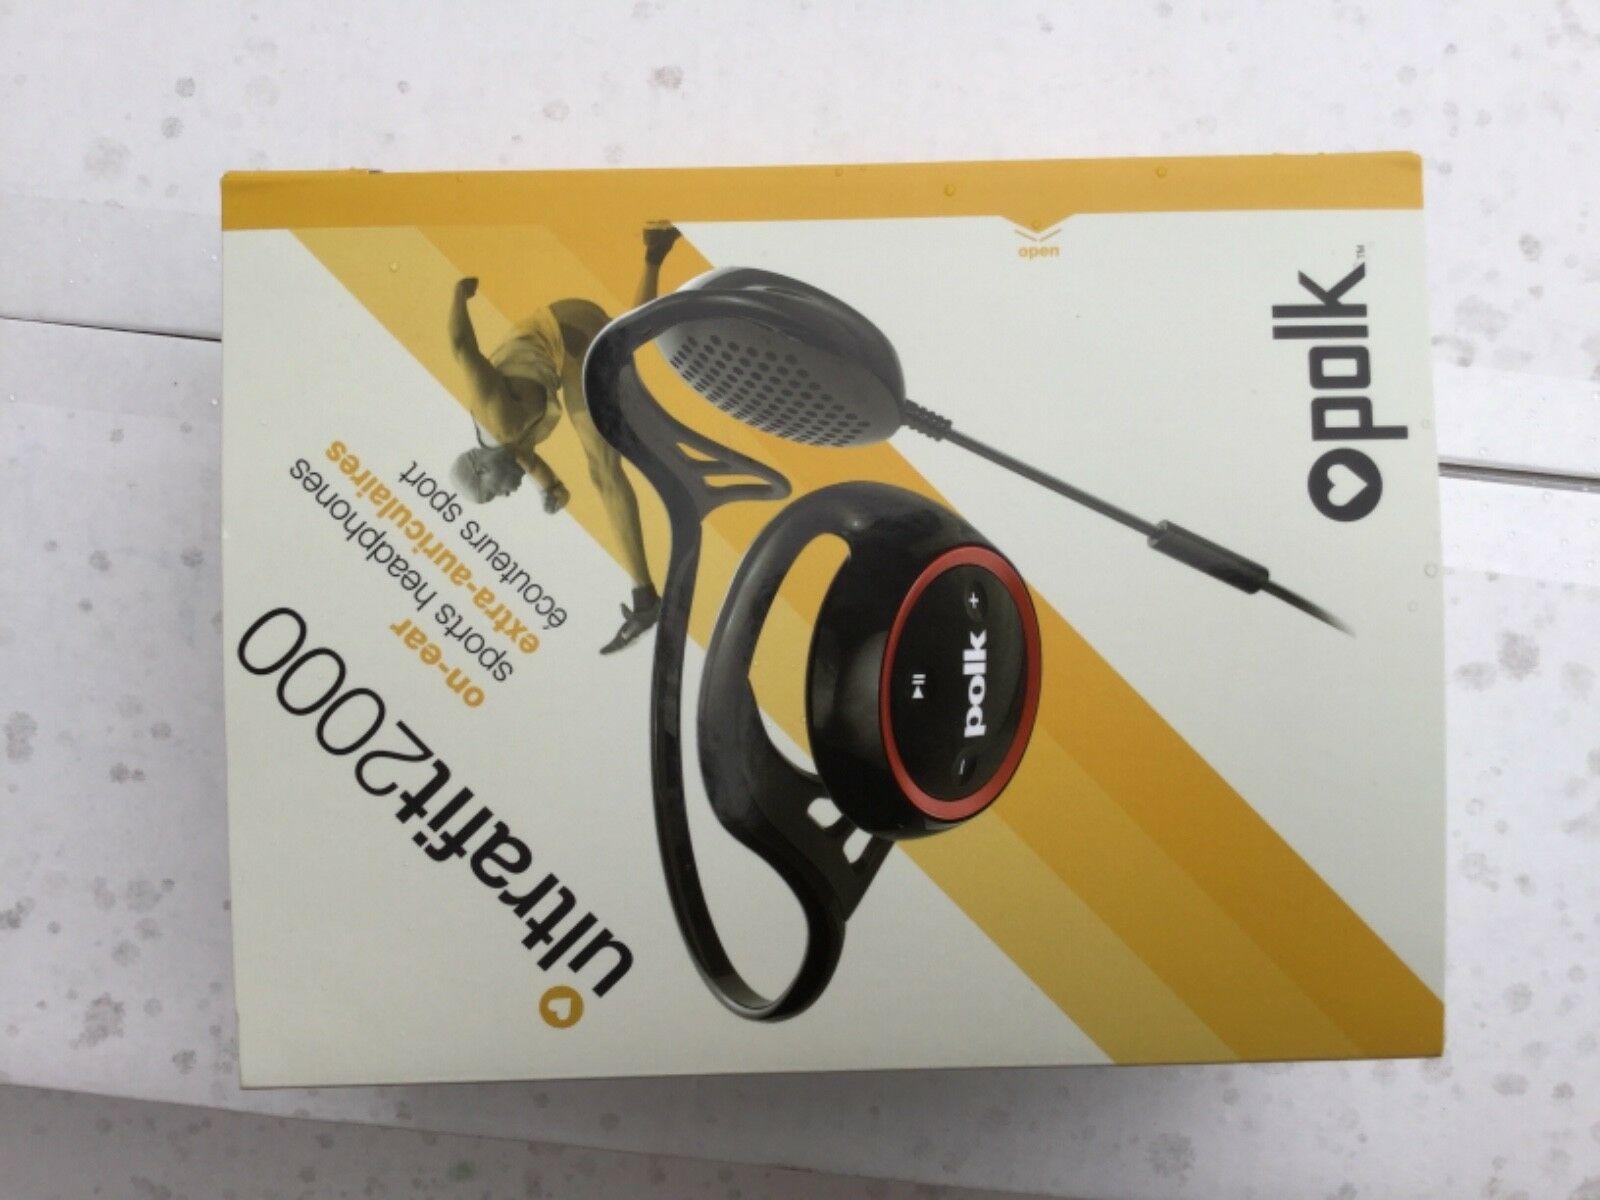 Polk Audio UltraFit 2000 sports headphones (Black/Red) image 11